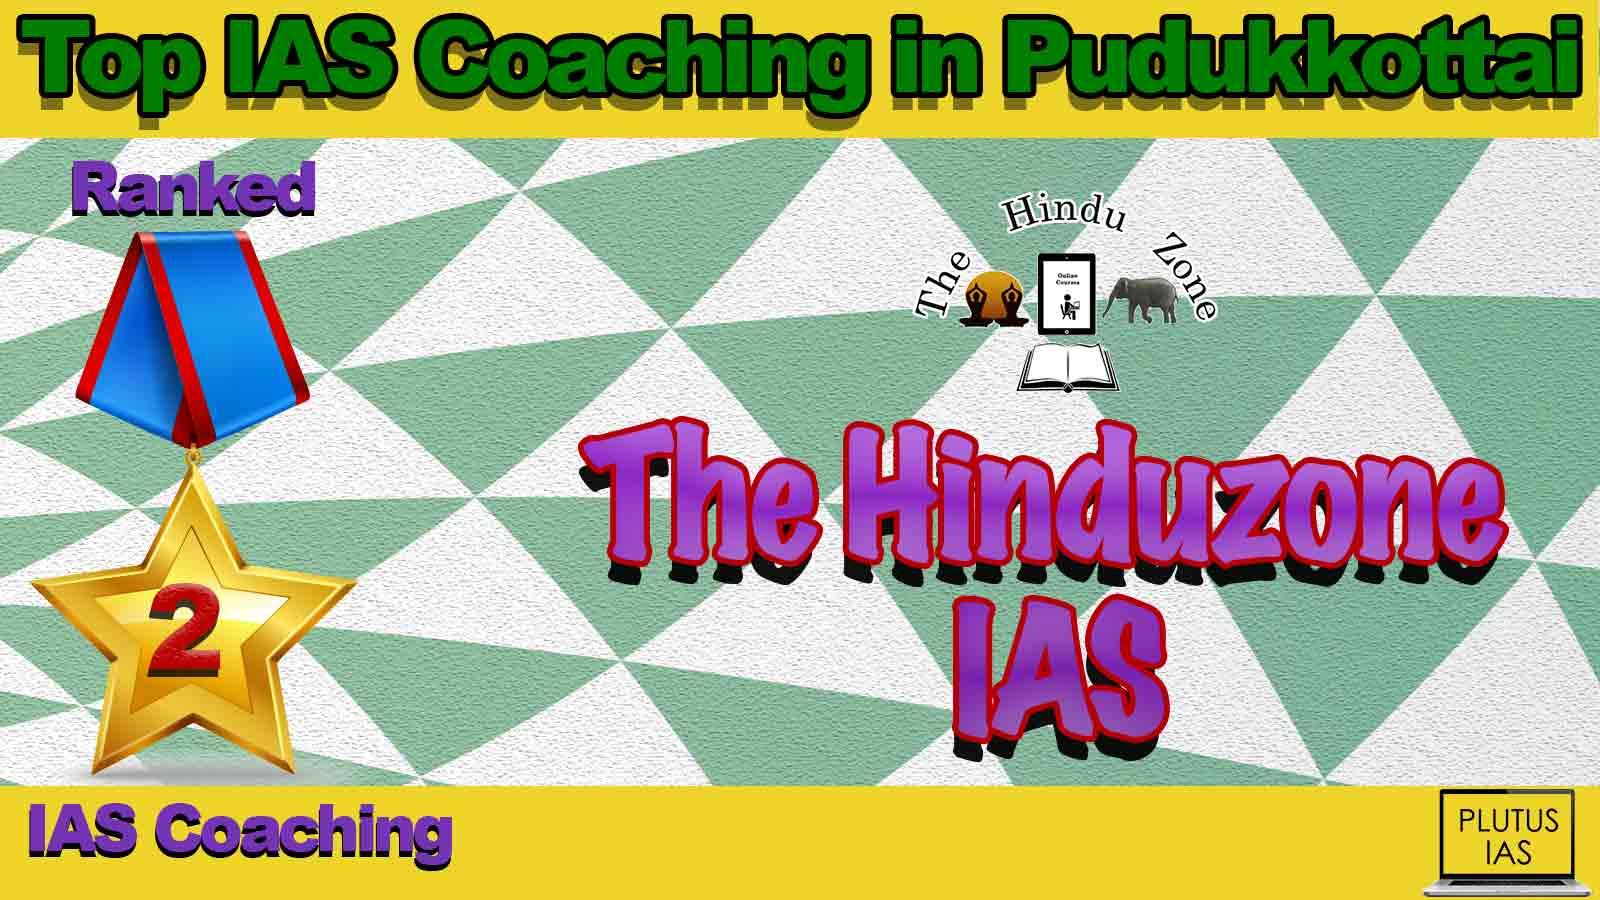 Best IAS Coaching in Pudukkottai